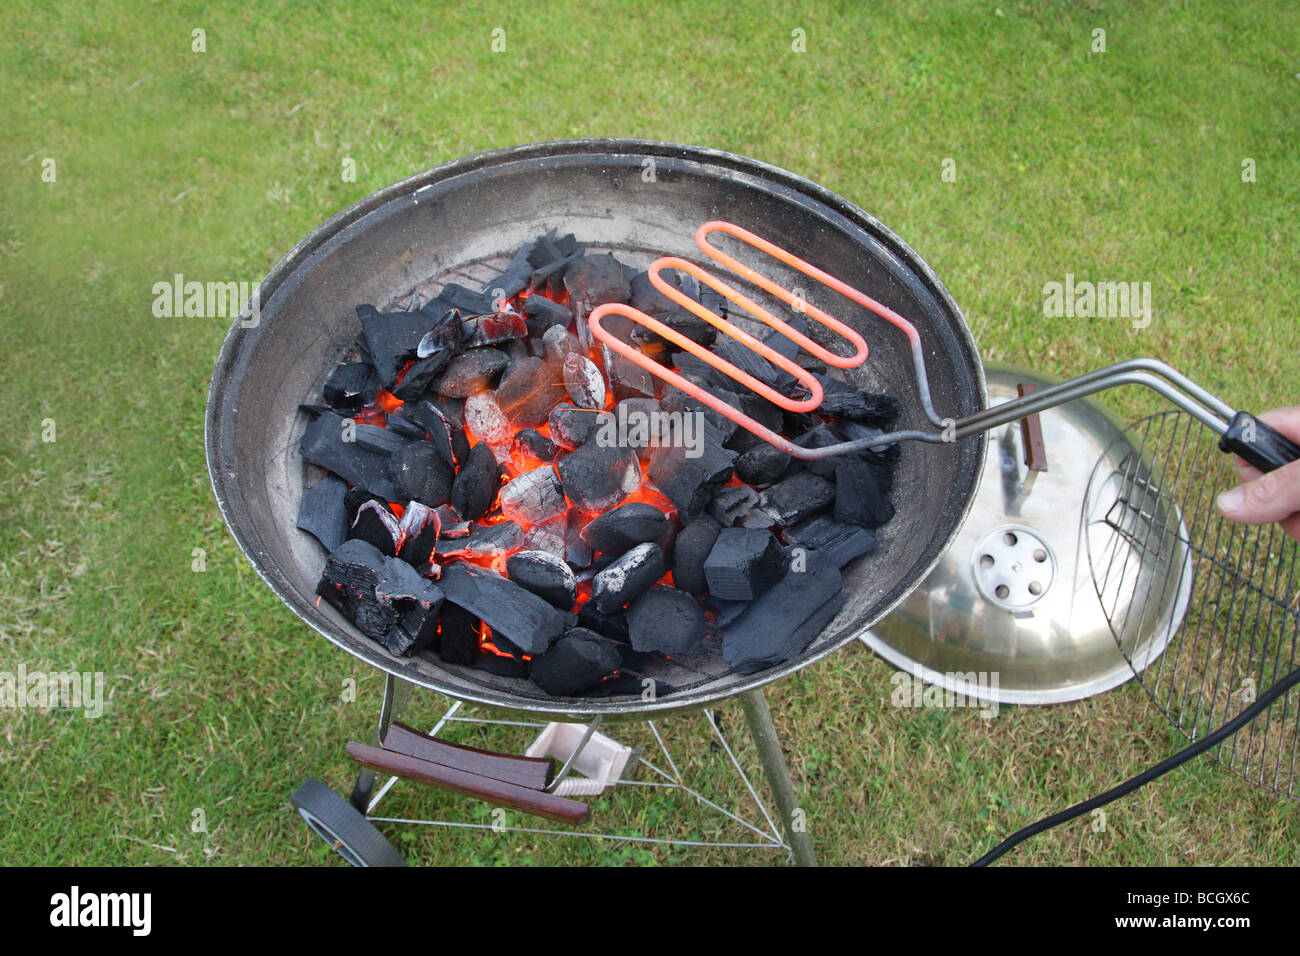 Ambiente elettrico friendly ecofriendly barbecue avviamento